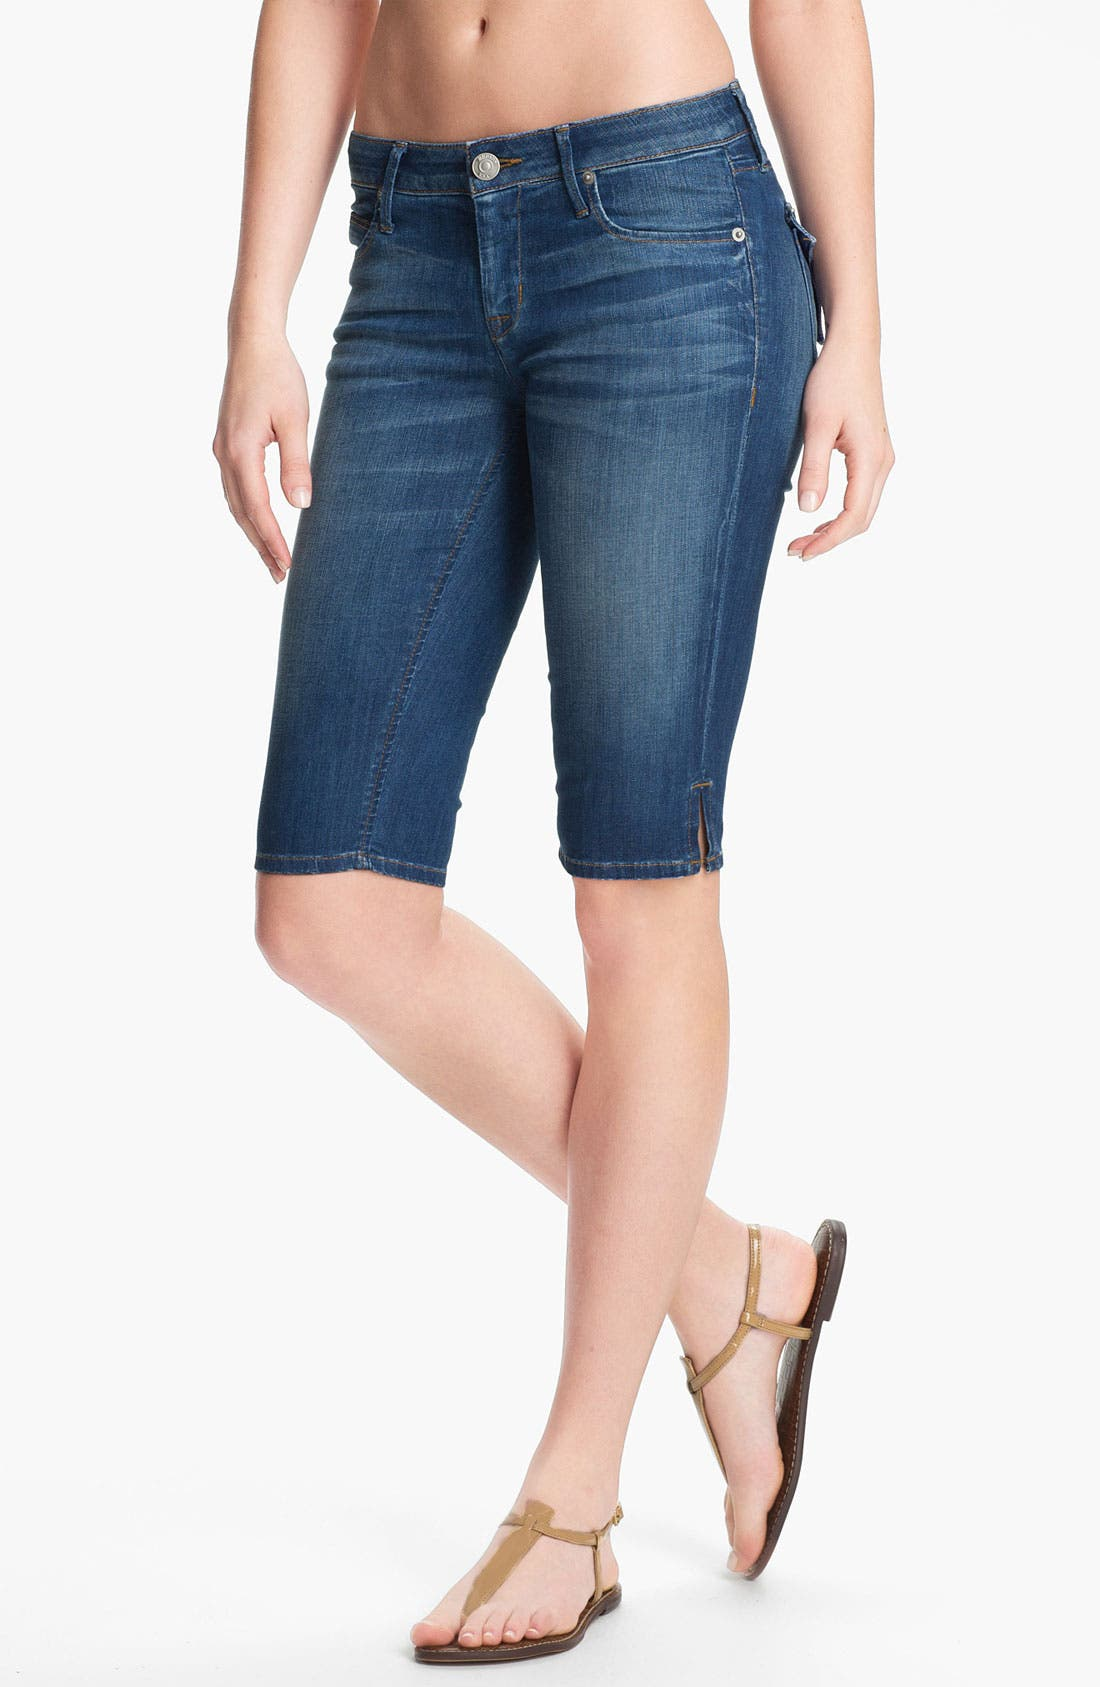 Main Image - Hudson Jeans 'Viceroy' Stretch Denim Bermuda Shorts (Morrissey)